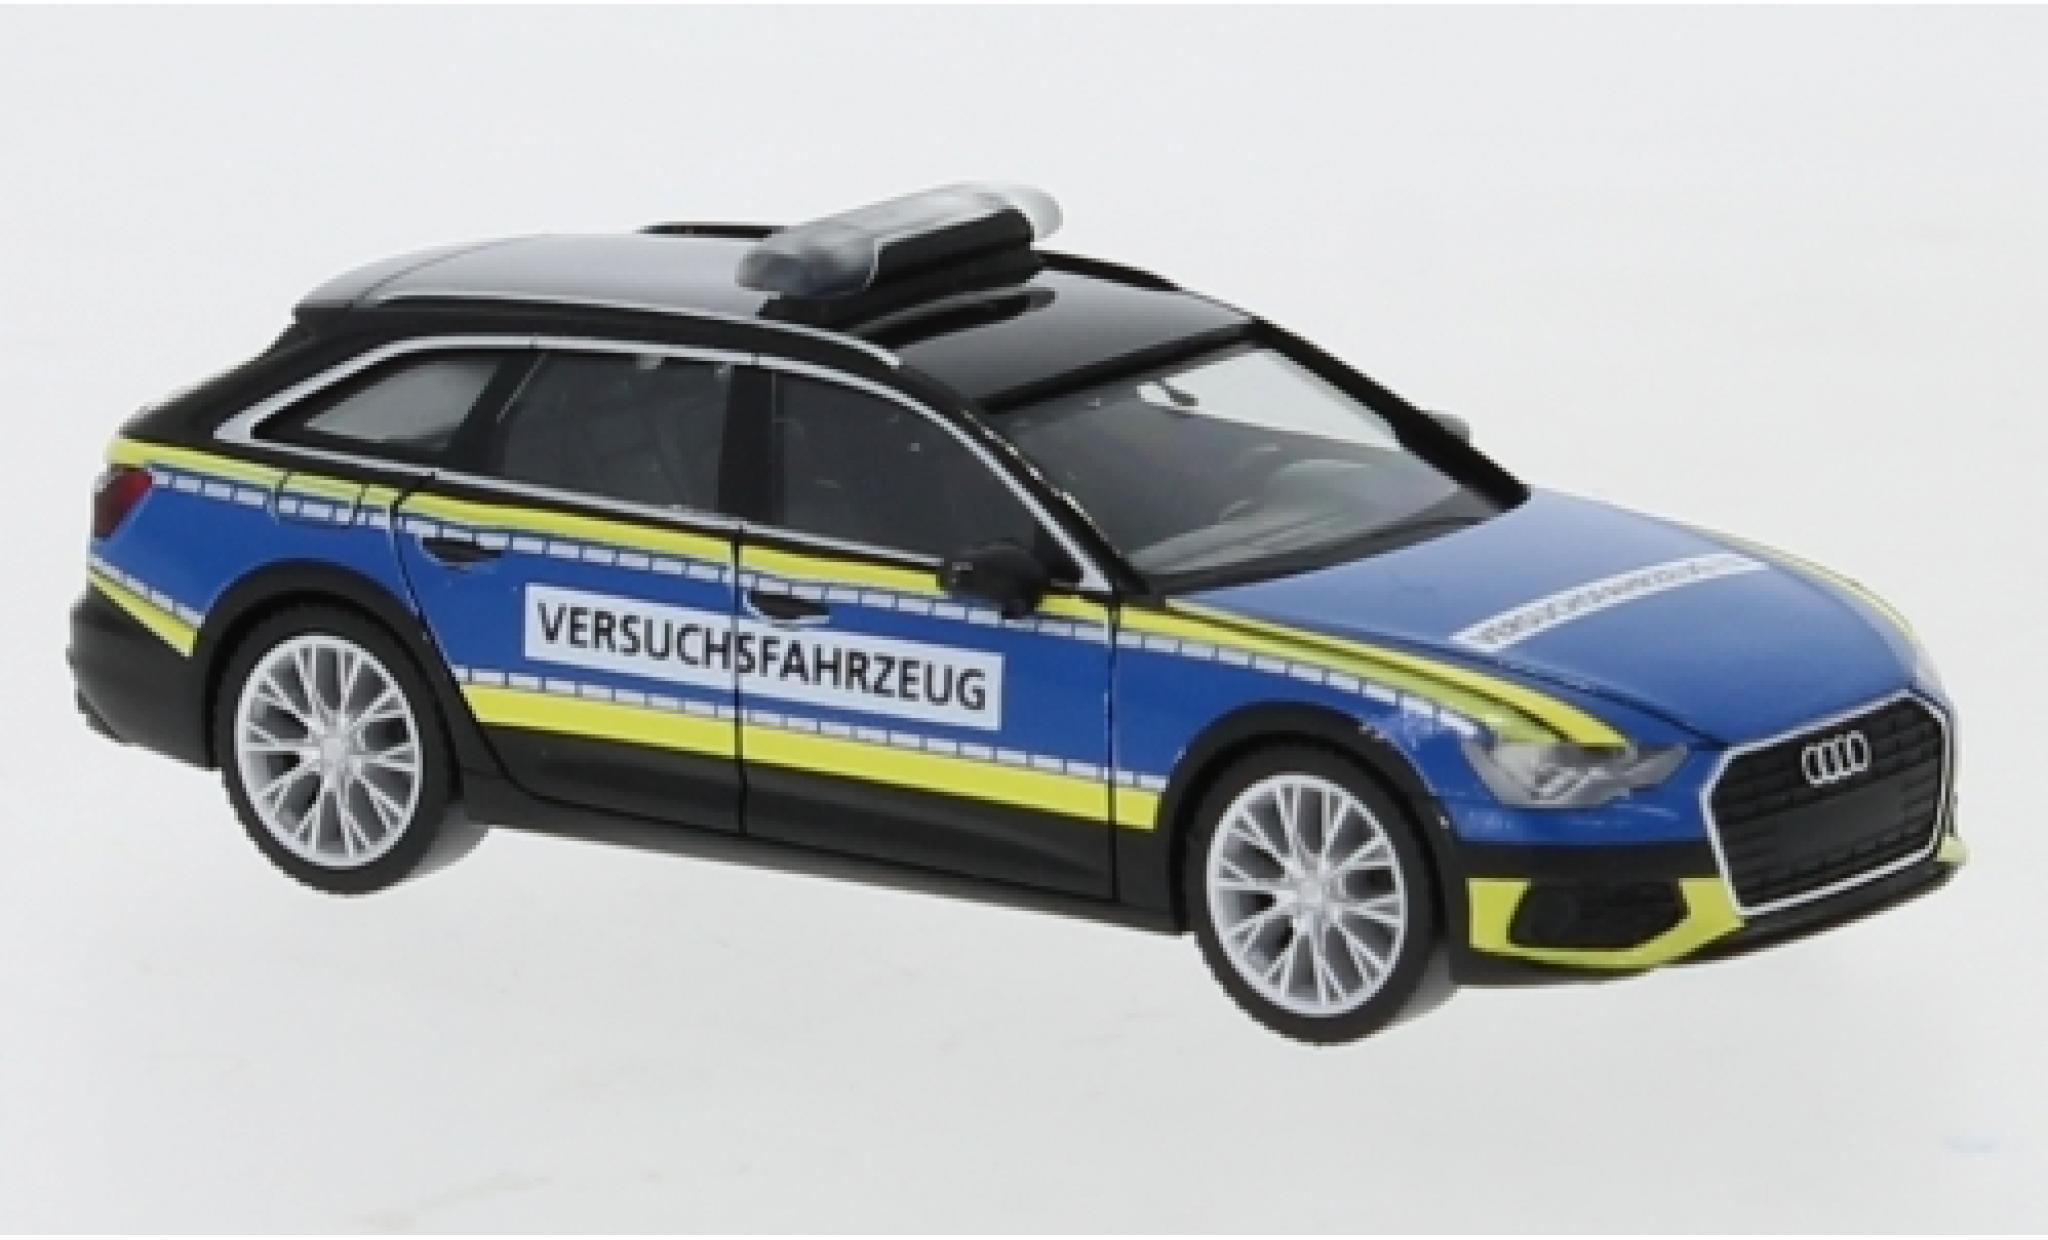 Audi A6 1/87 Herpa Avant Polizei Versuchsfahrzeug